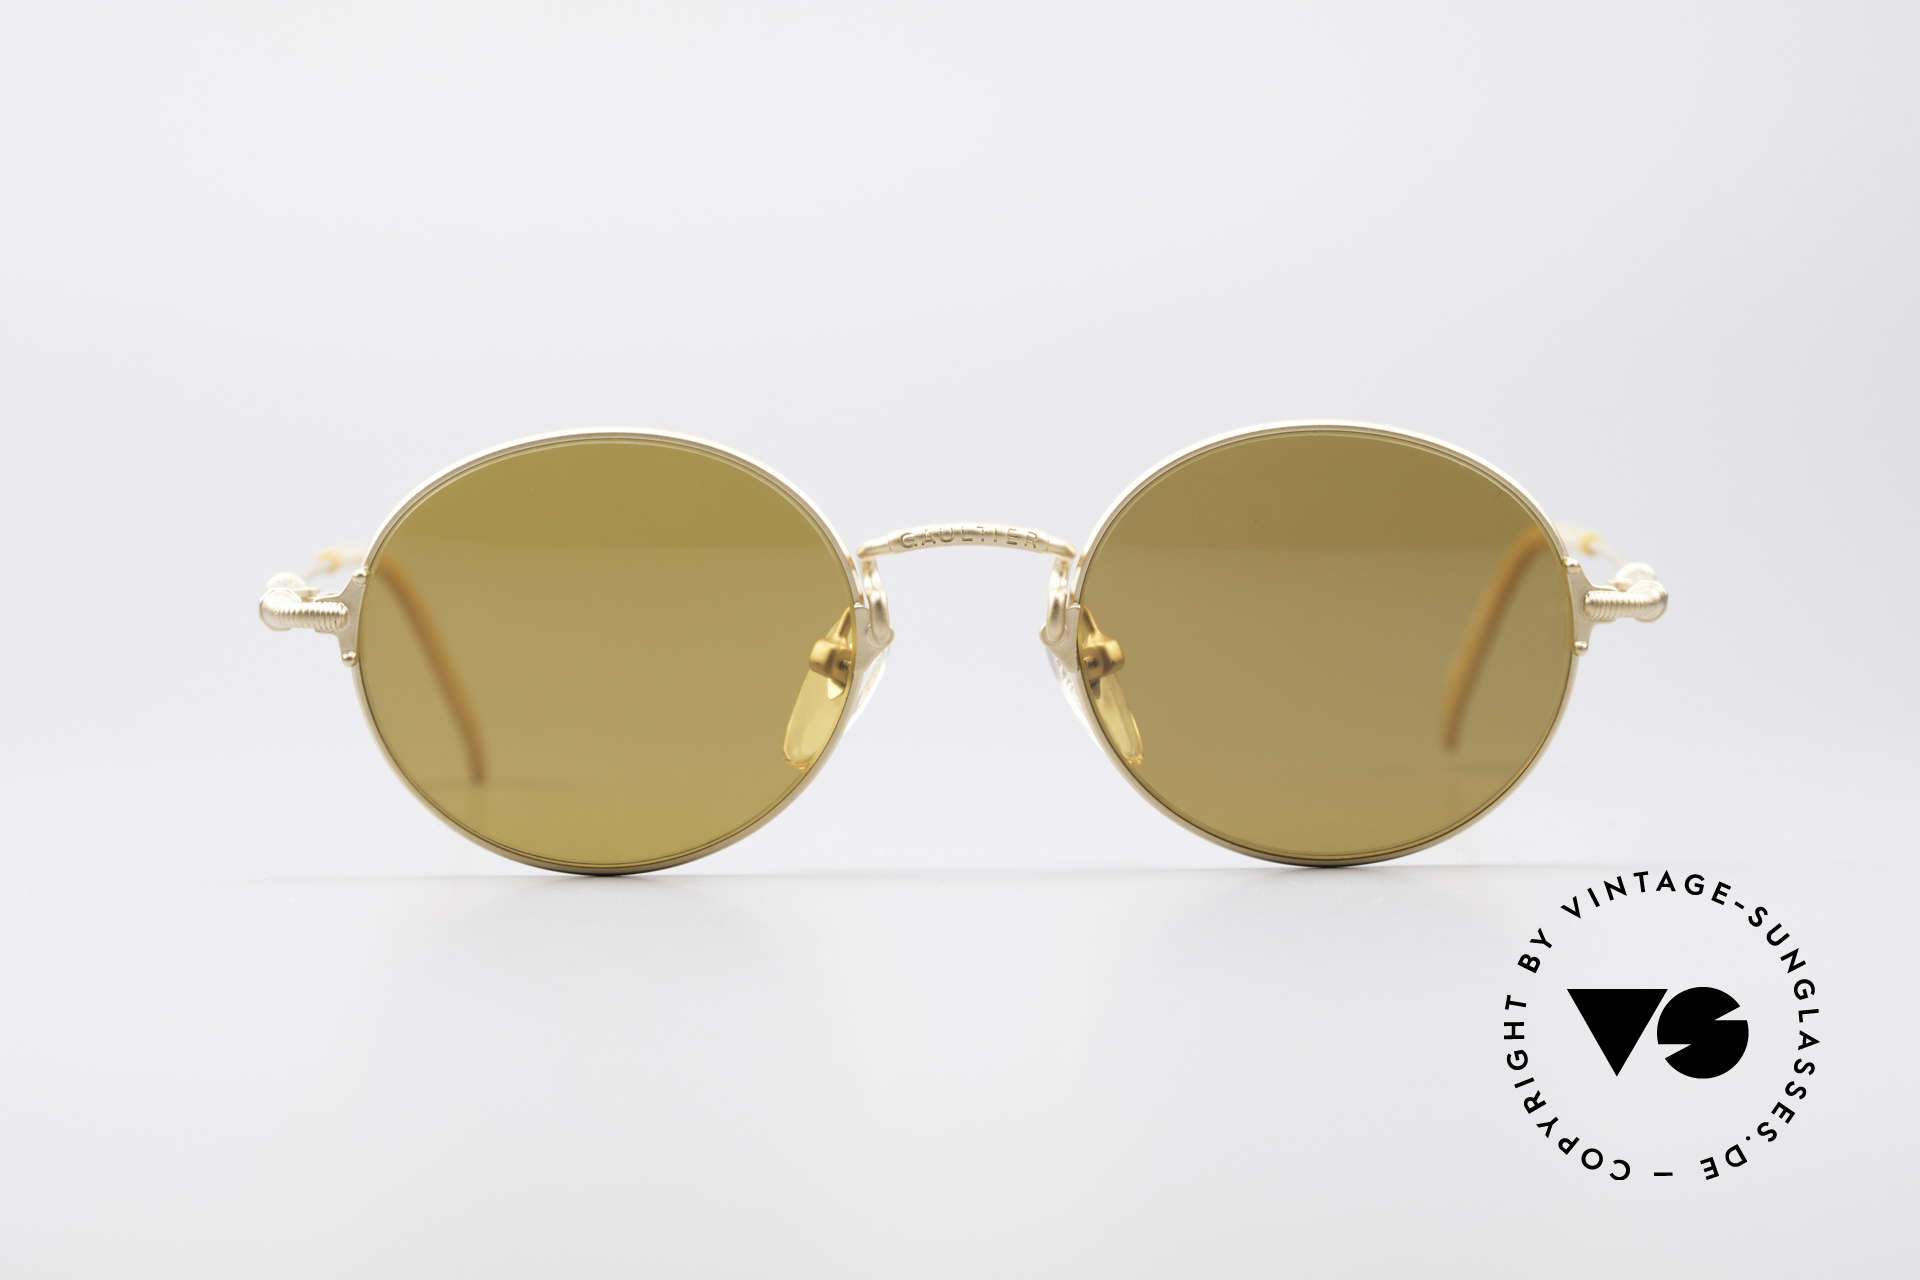 a20d5c386 Sunglasses Jean Paul Gaultier 55-6109 Gold Plated Polarized Shades ...